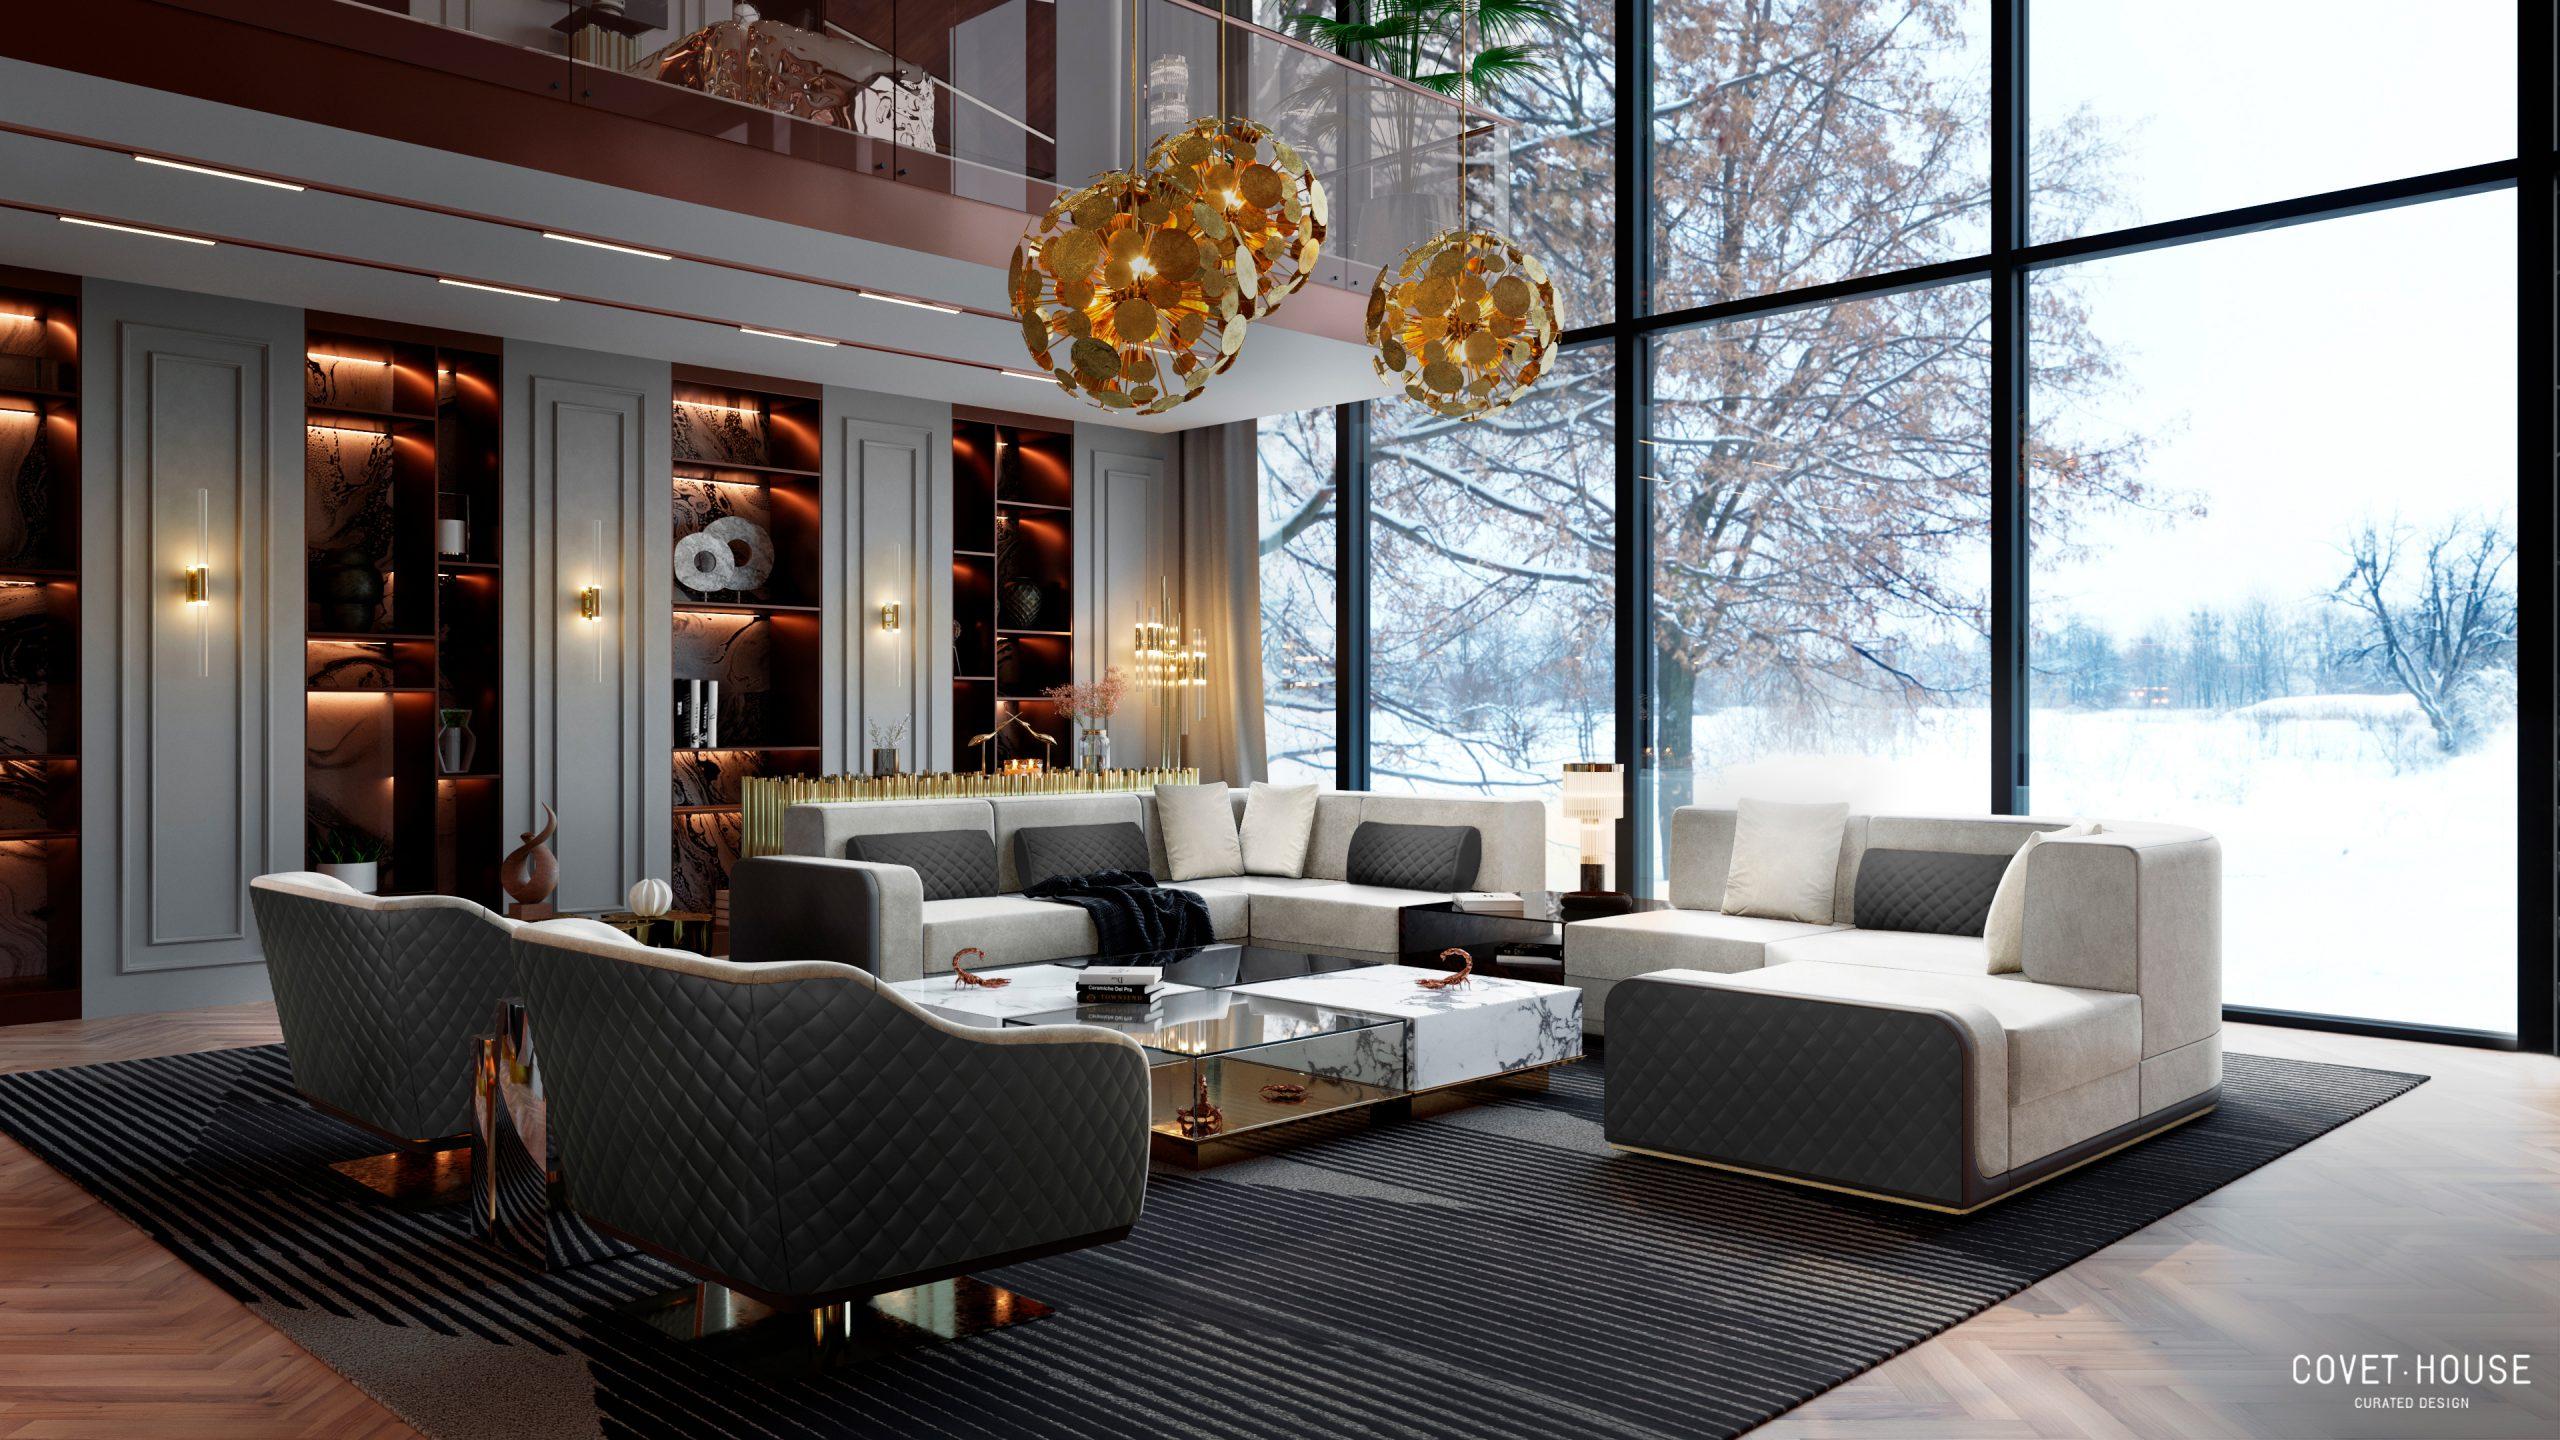 Sofas lujuosos: Ideas para una Sala de estar poderosa y elegante sofas lujuosos Sofas lujuosos: Ideas para una Sala de estar poderosa y elegante thomson sofa cover 04 scaled 1